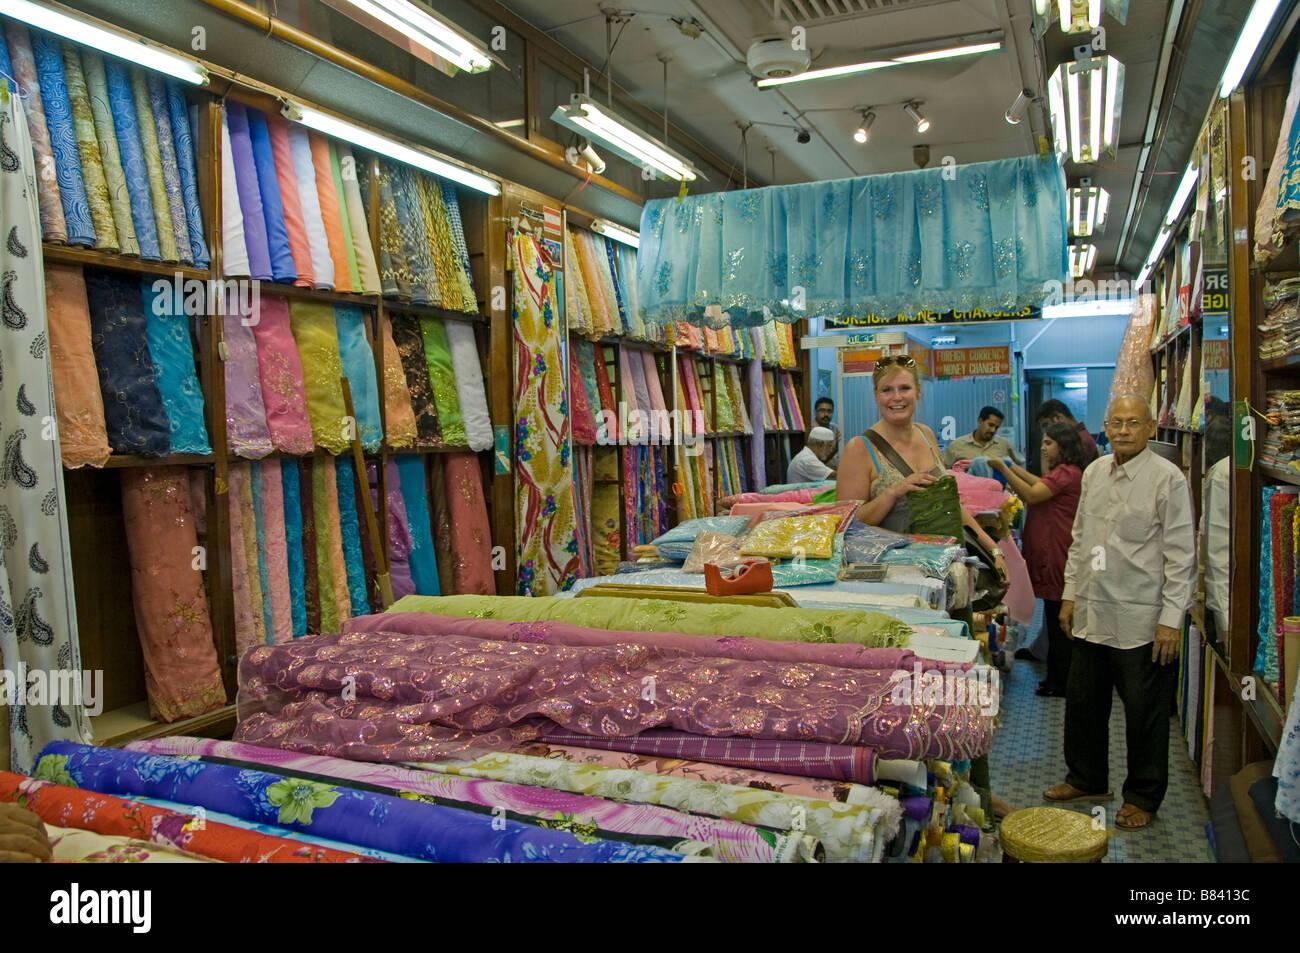 Arab Quarter Singapore Kampong Glam Silk - Stock Image